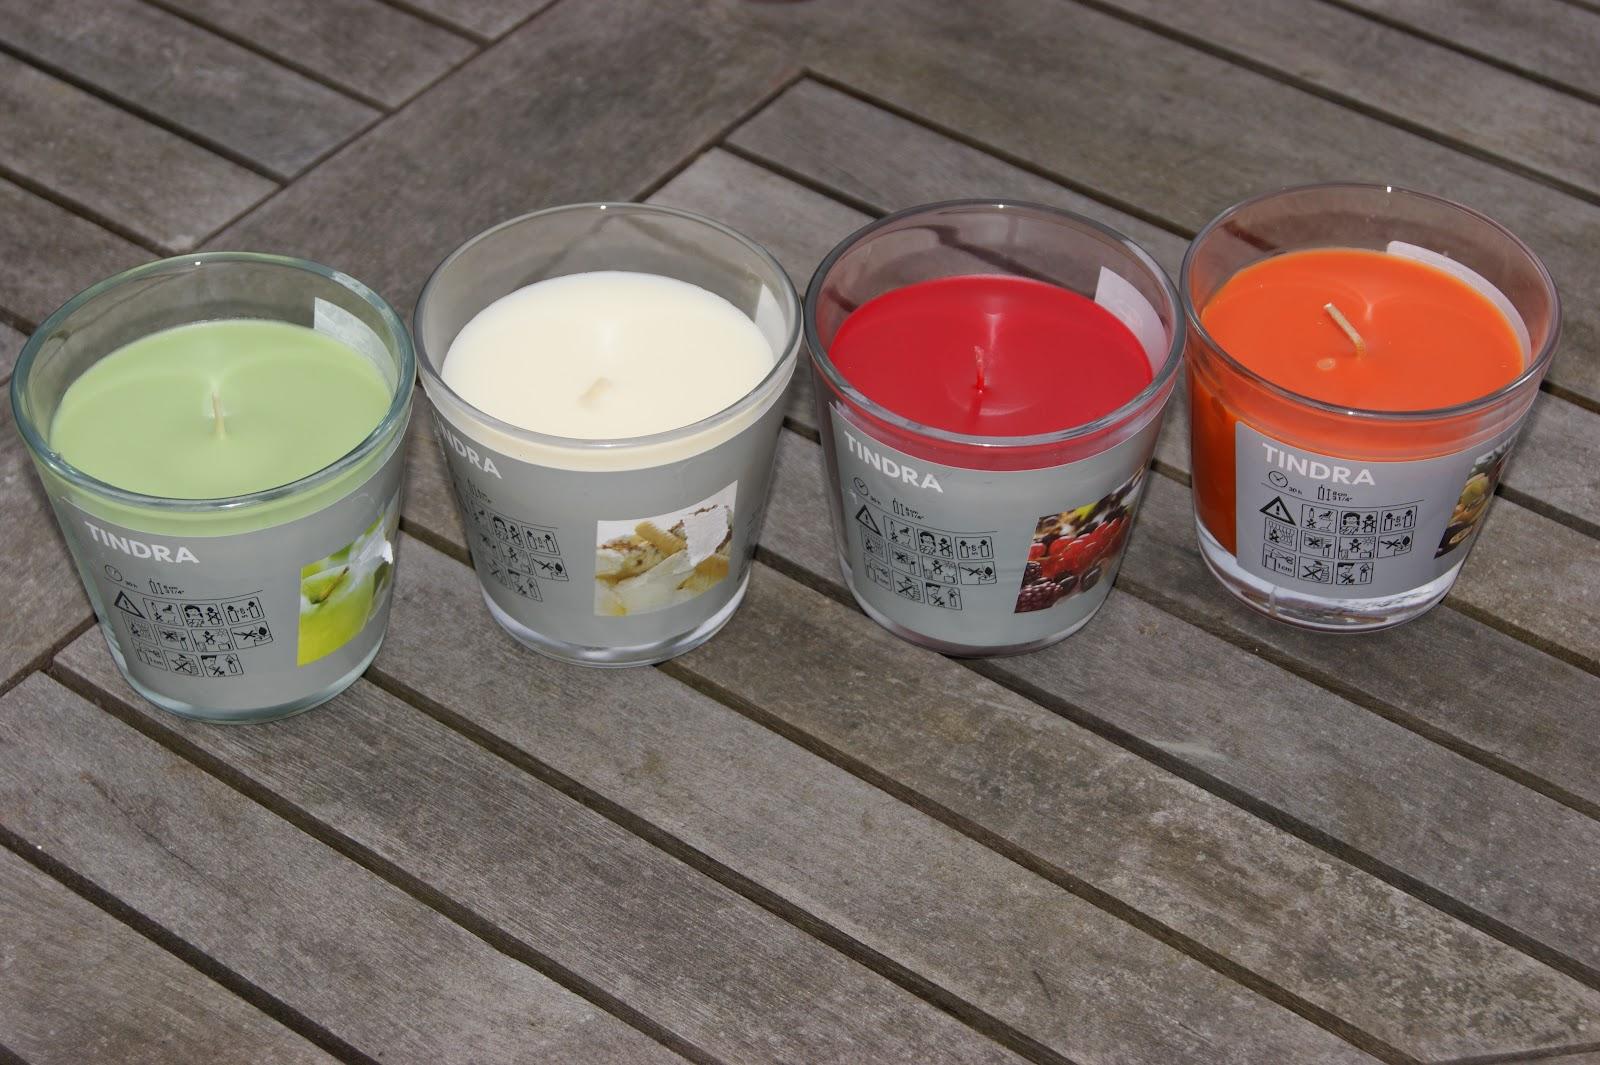 Ikea Tindra Candles The Sunday Girl